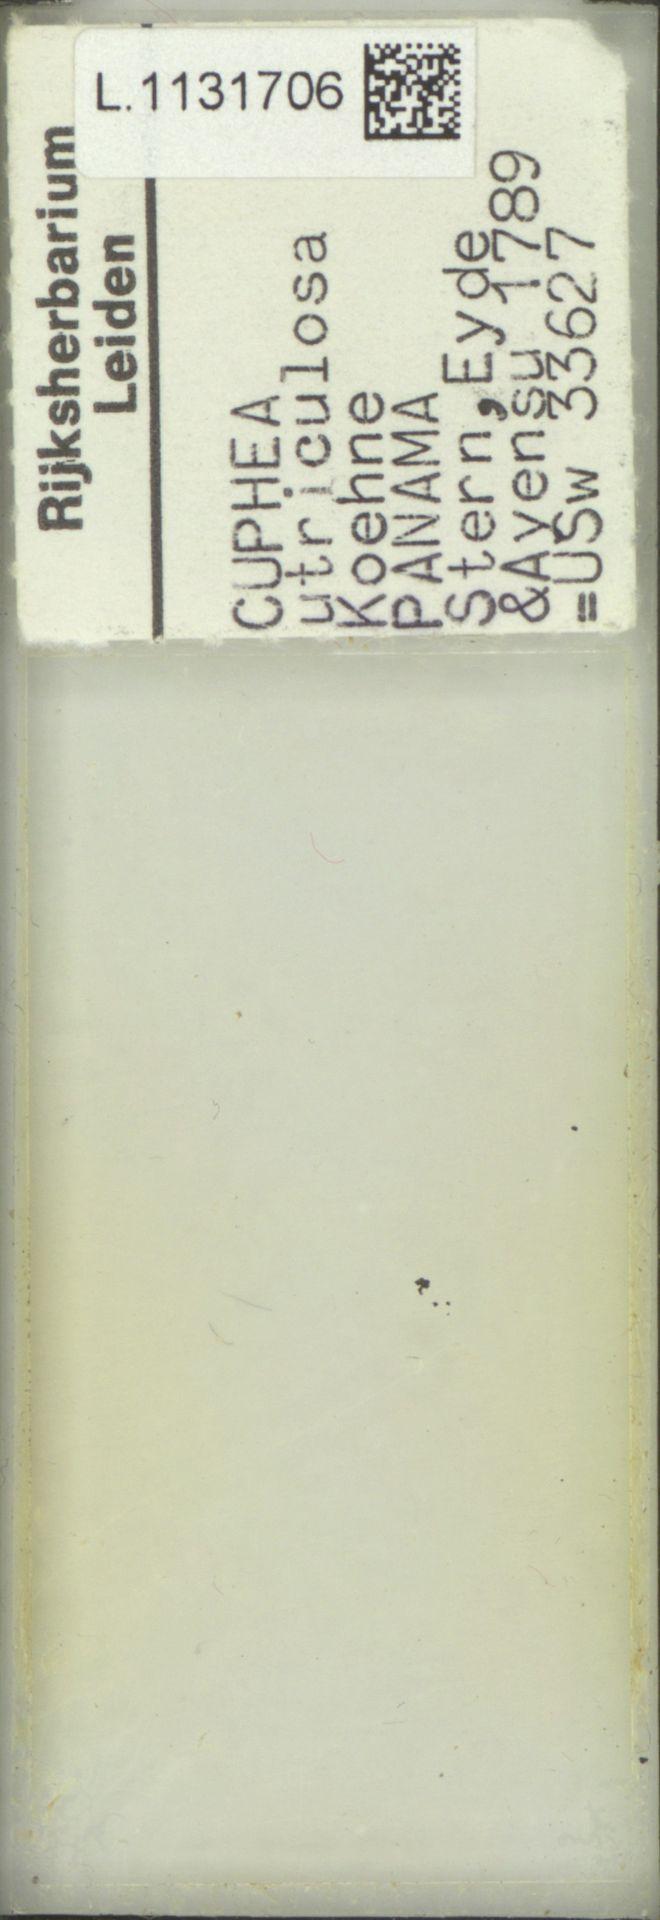 L.1131706 | Cuphea utriculosa Koehne